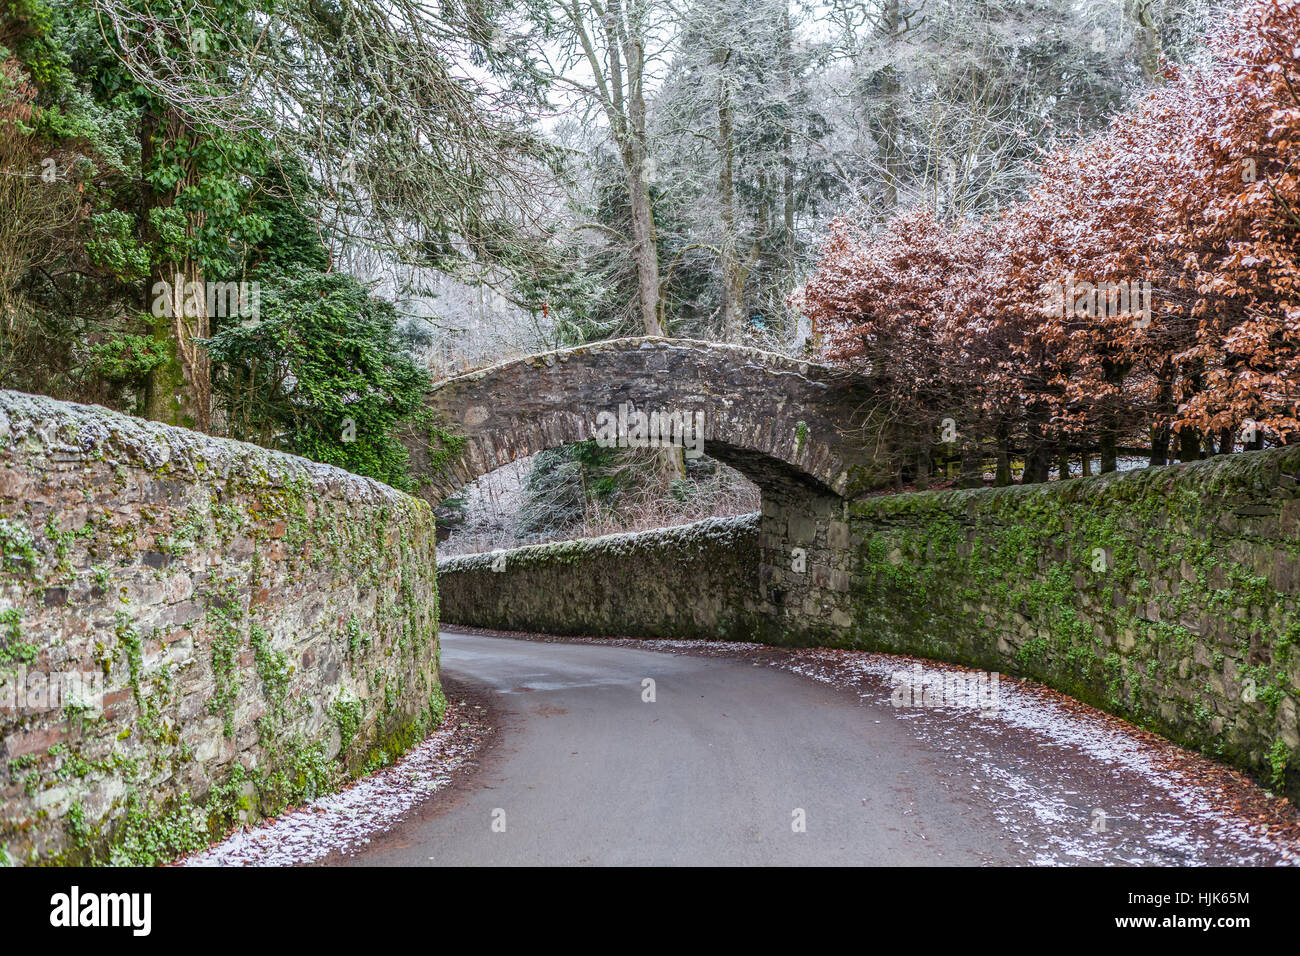 An old stone bridge crosses the road near Glen Tilt, Perthshire, Scotland, UK - Stock Image